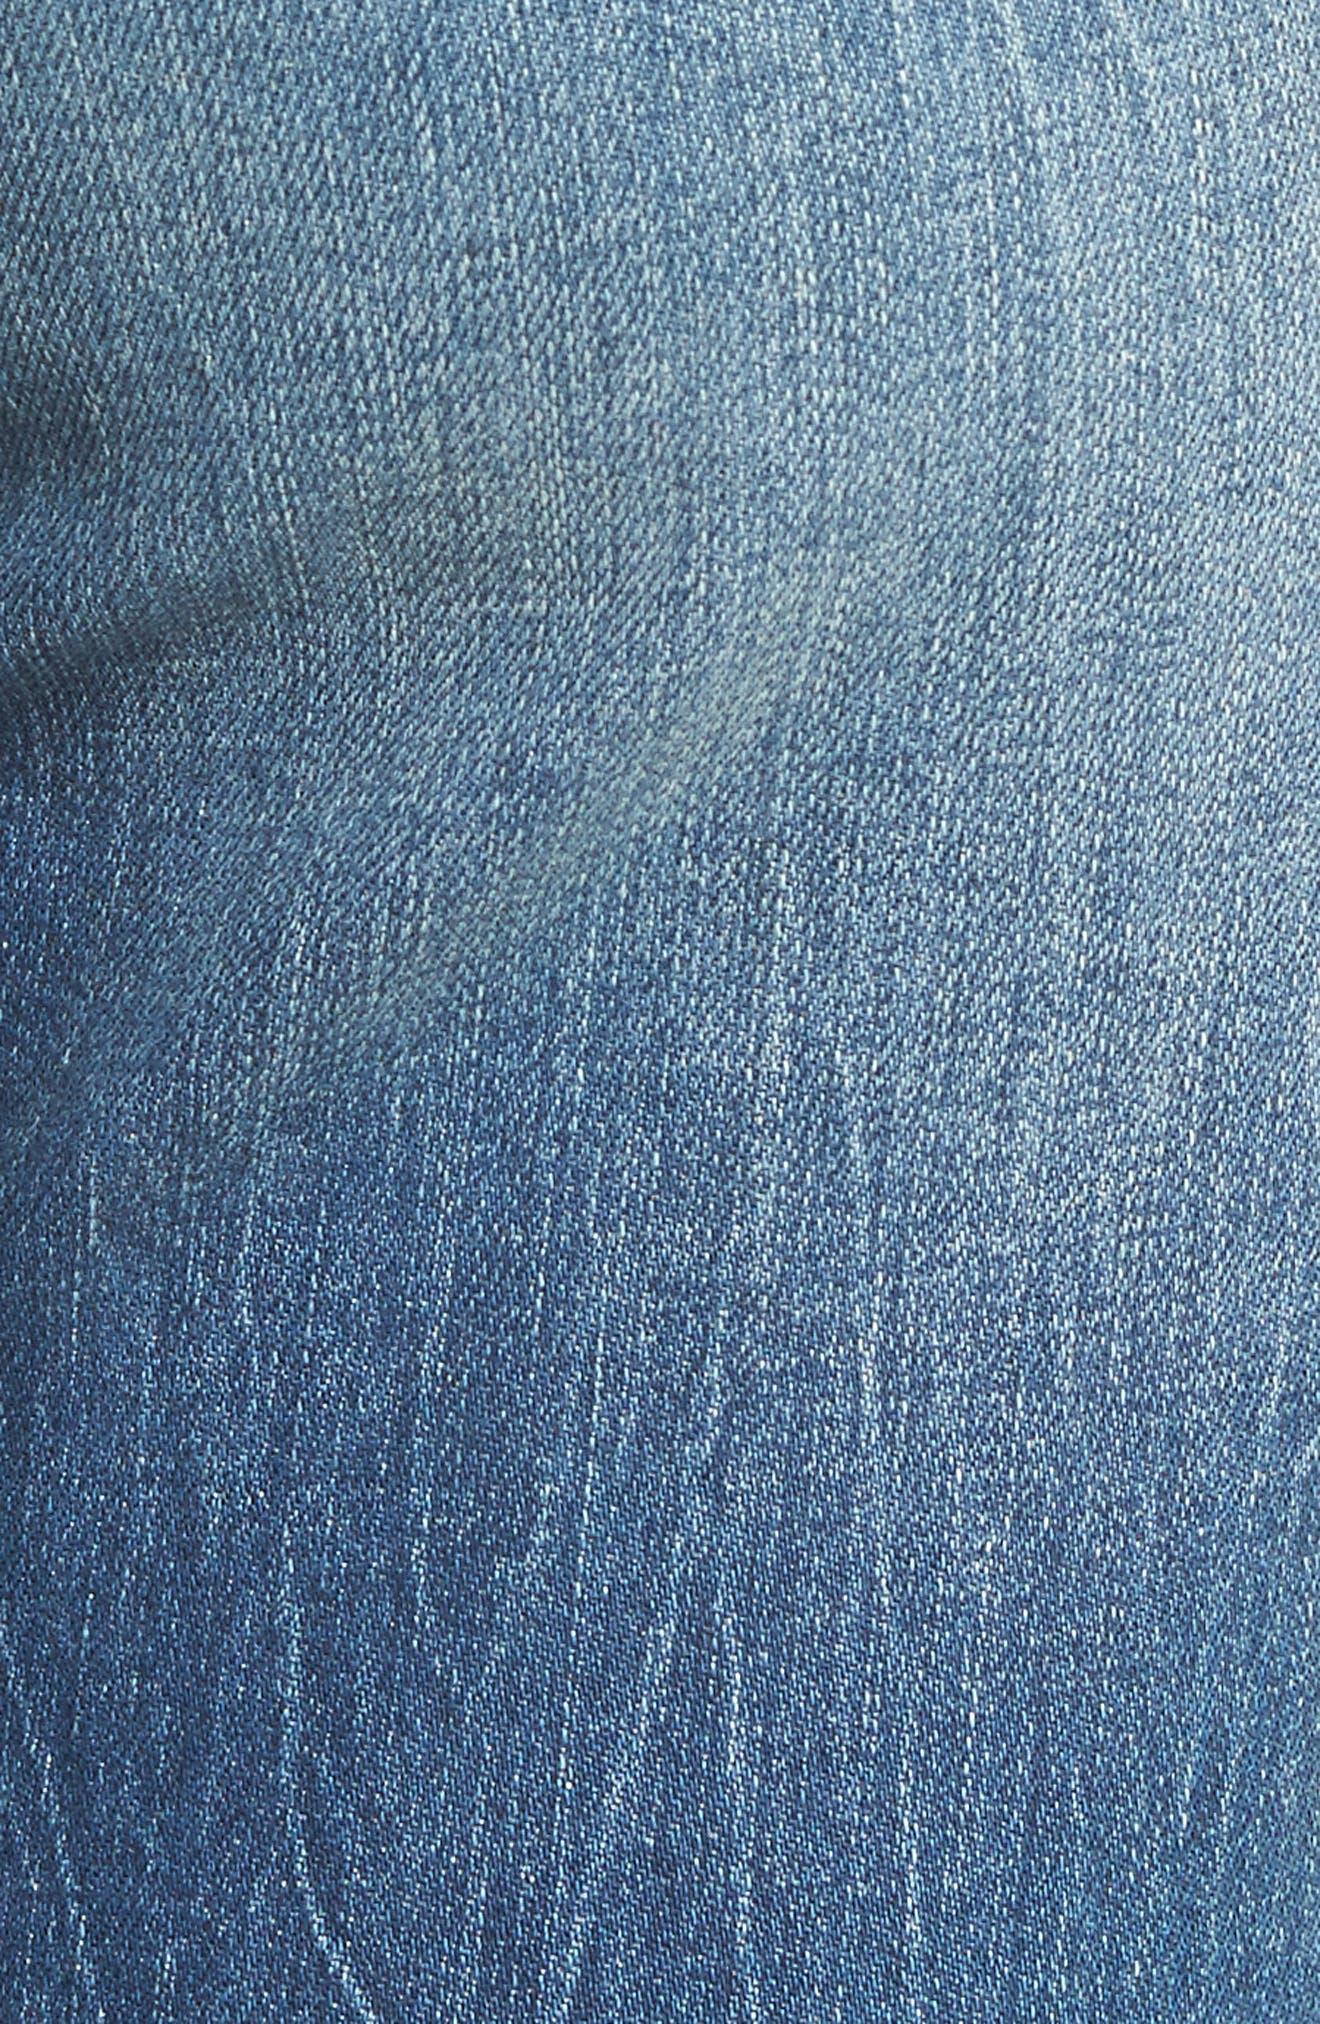 Alternate Image 5  - SLINK Jeans Distressed Ankle Boyfriend Jeans (Chelsea)